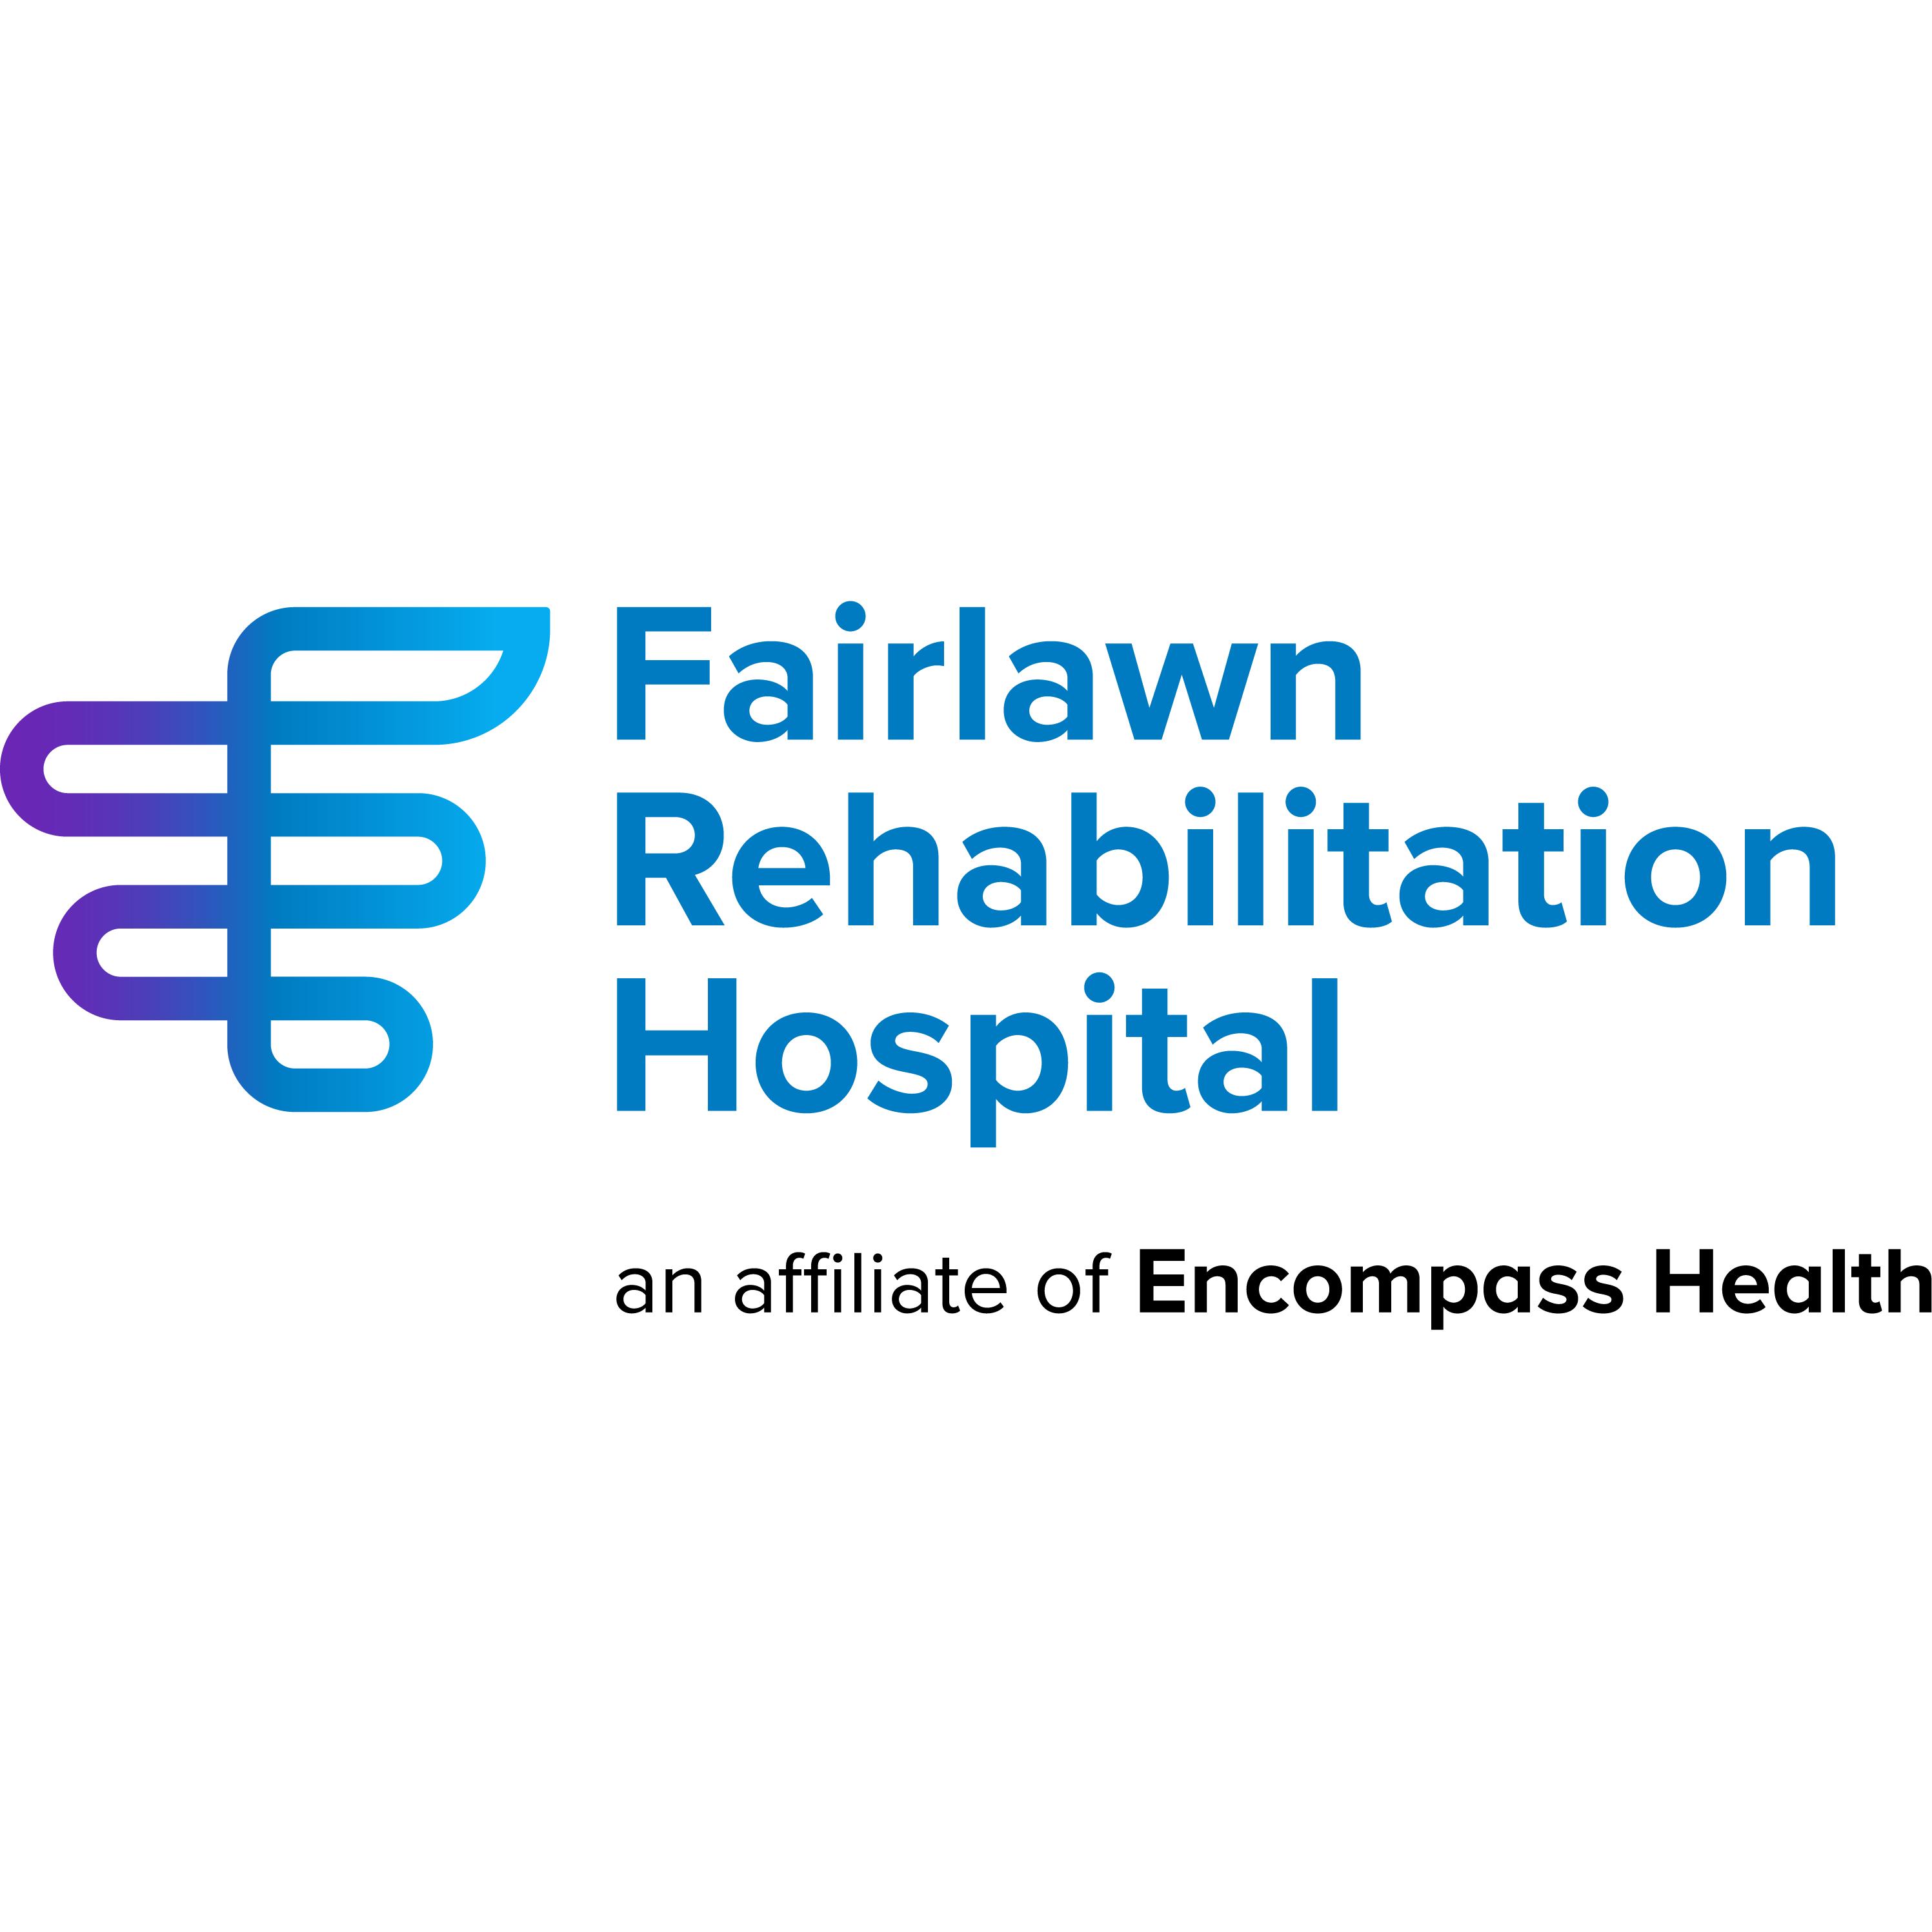 Fairlawn Rehabilitation Hospital, an affiliate of Encompass Health